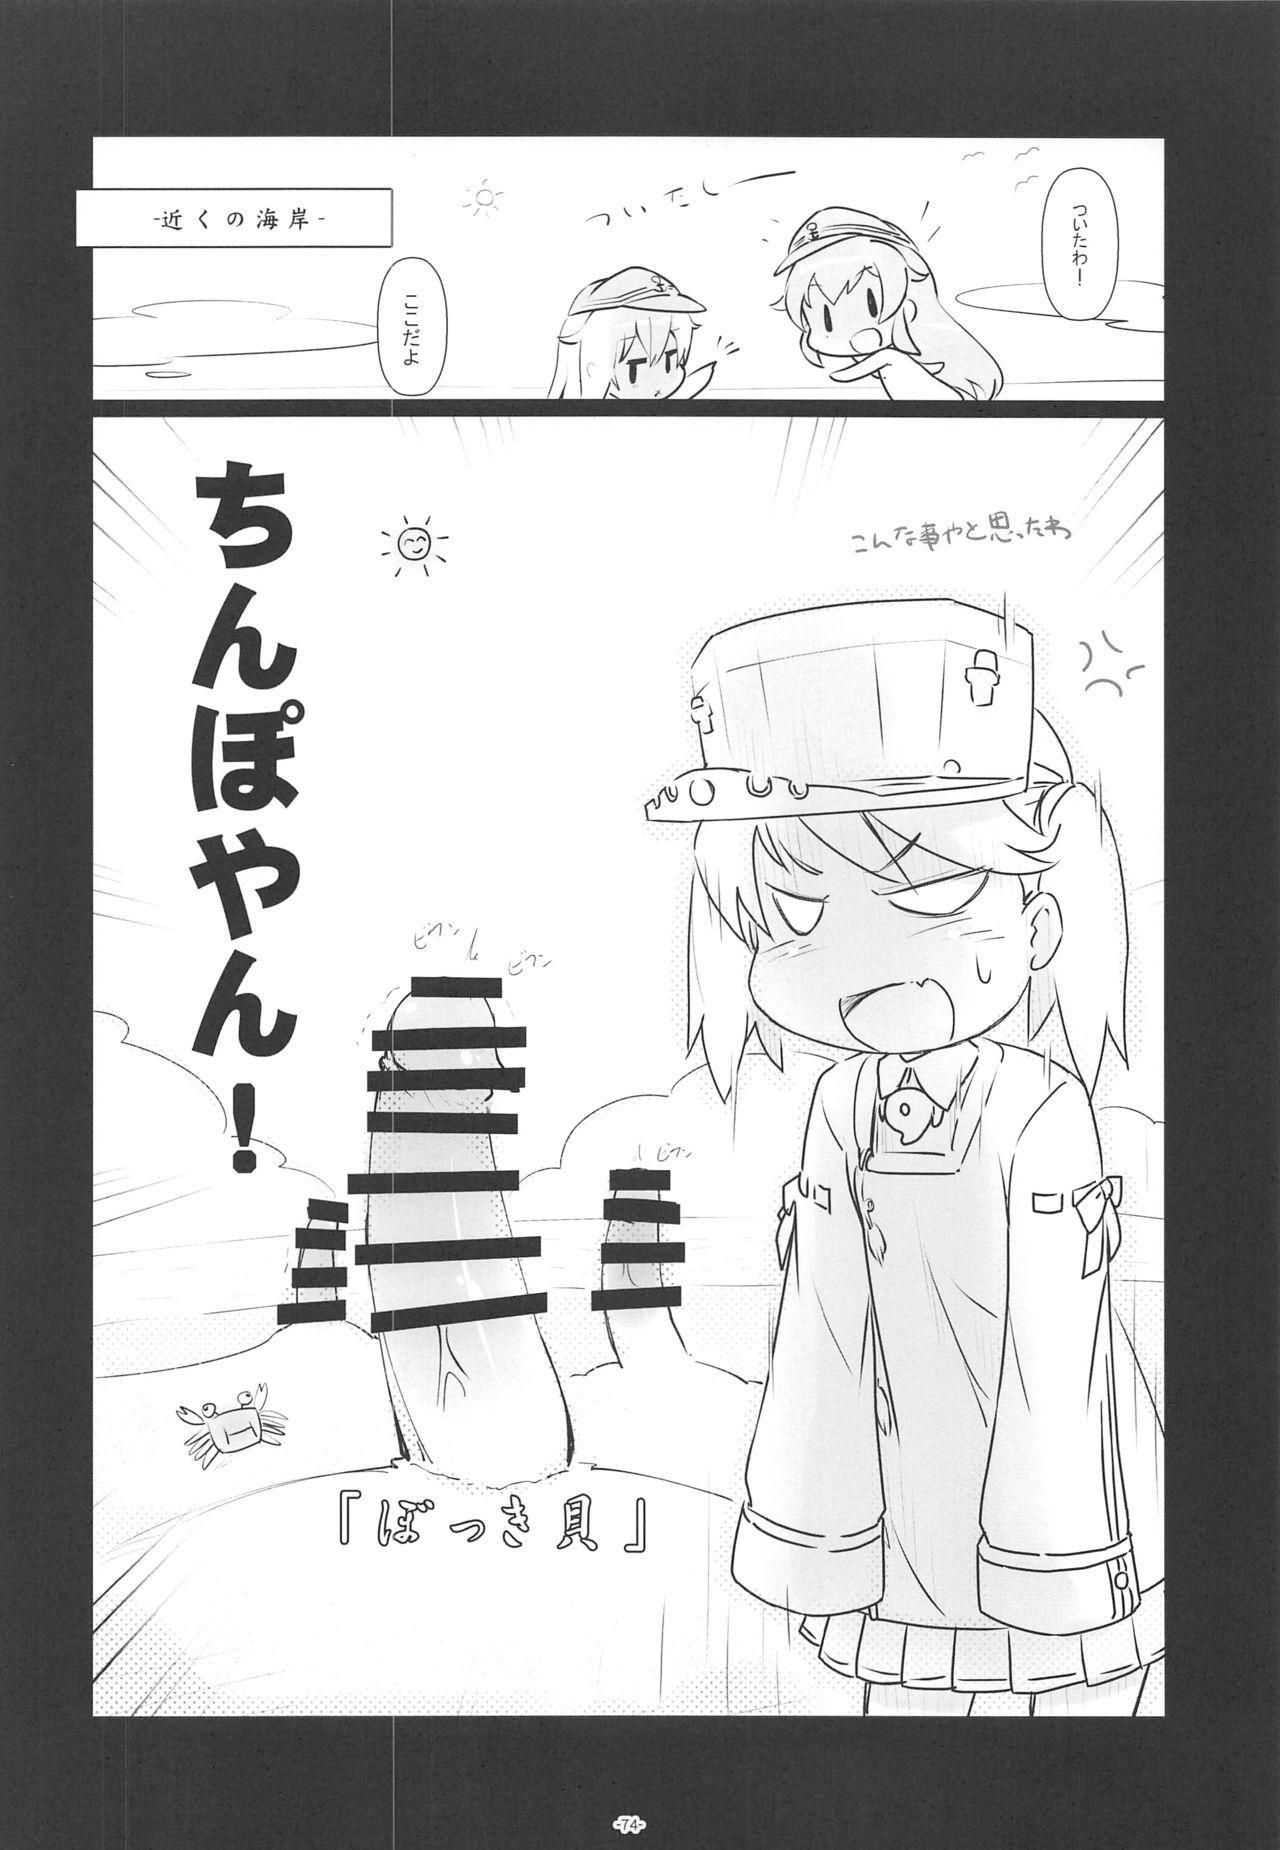 Korokoro-Manman II Korokoro:P Soushuuhen II 72